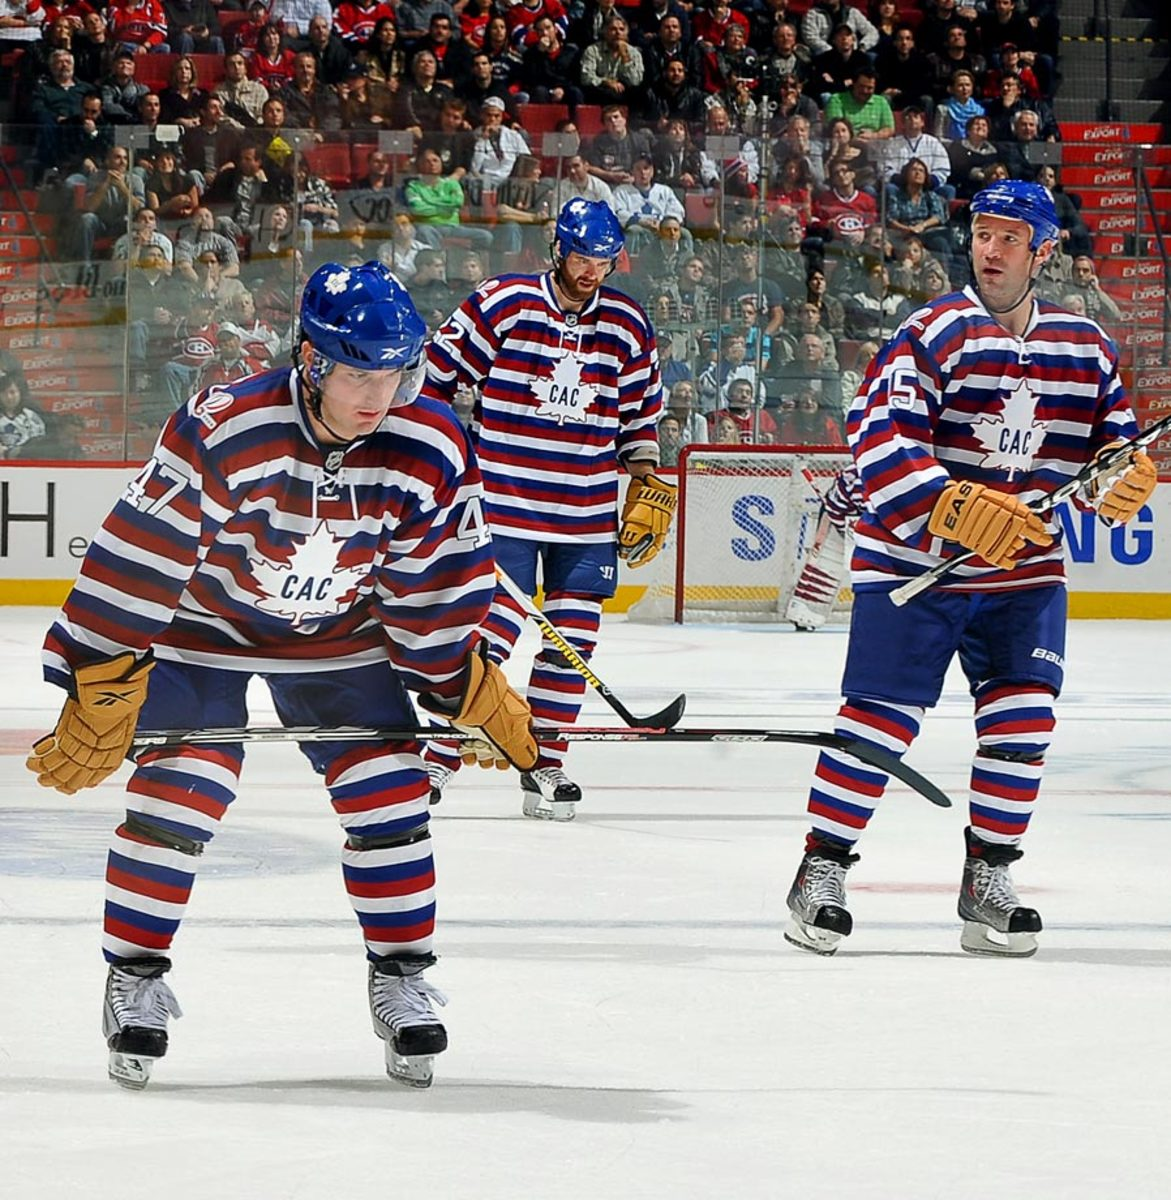 Montreal-Canadiens-uniforms-2009.jpeg